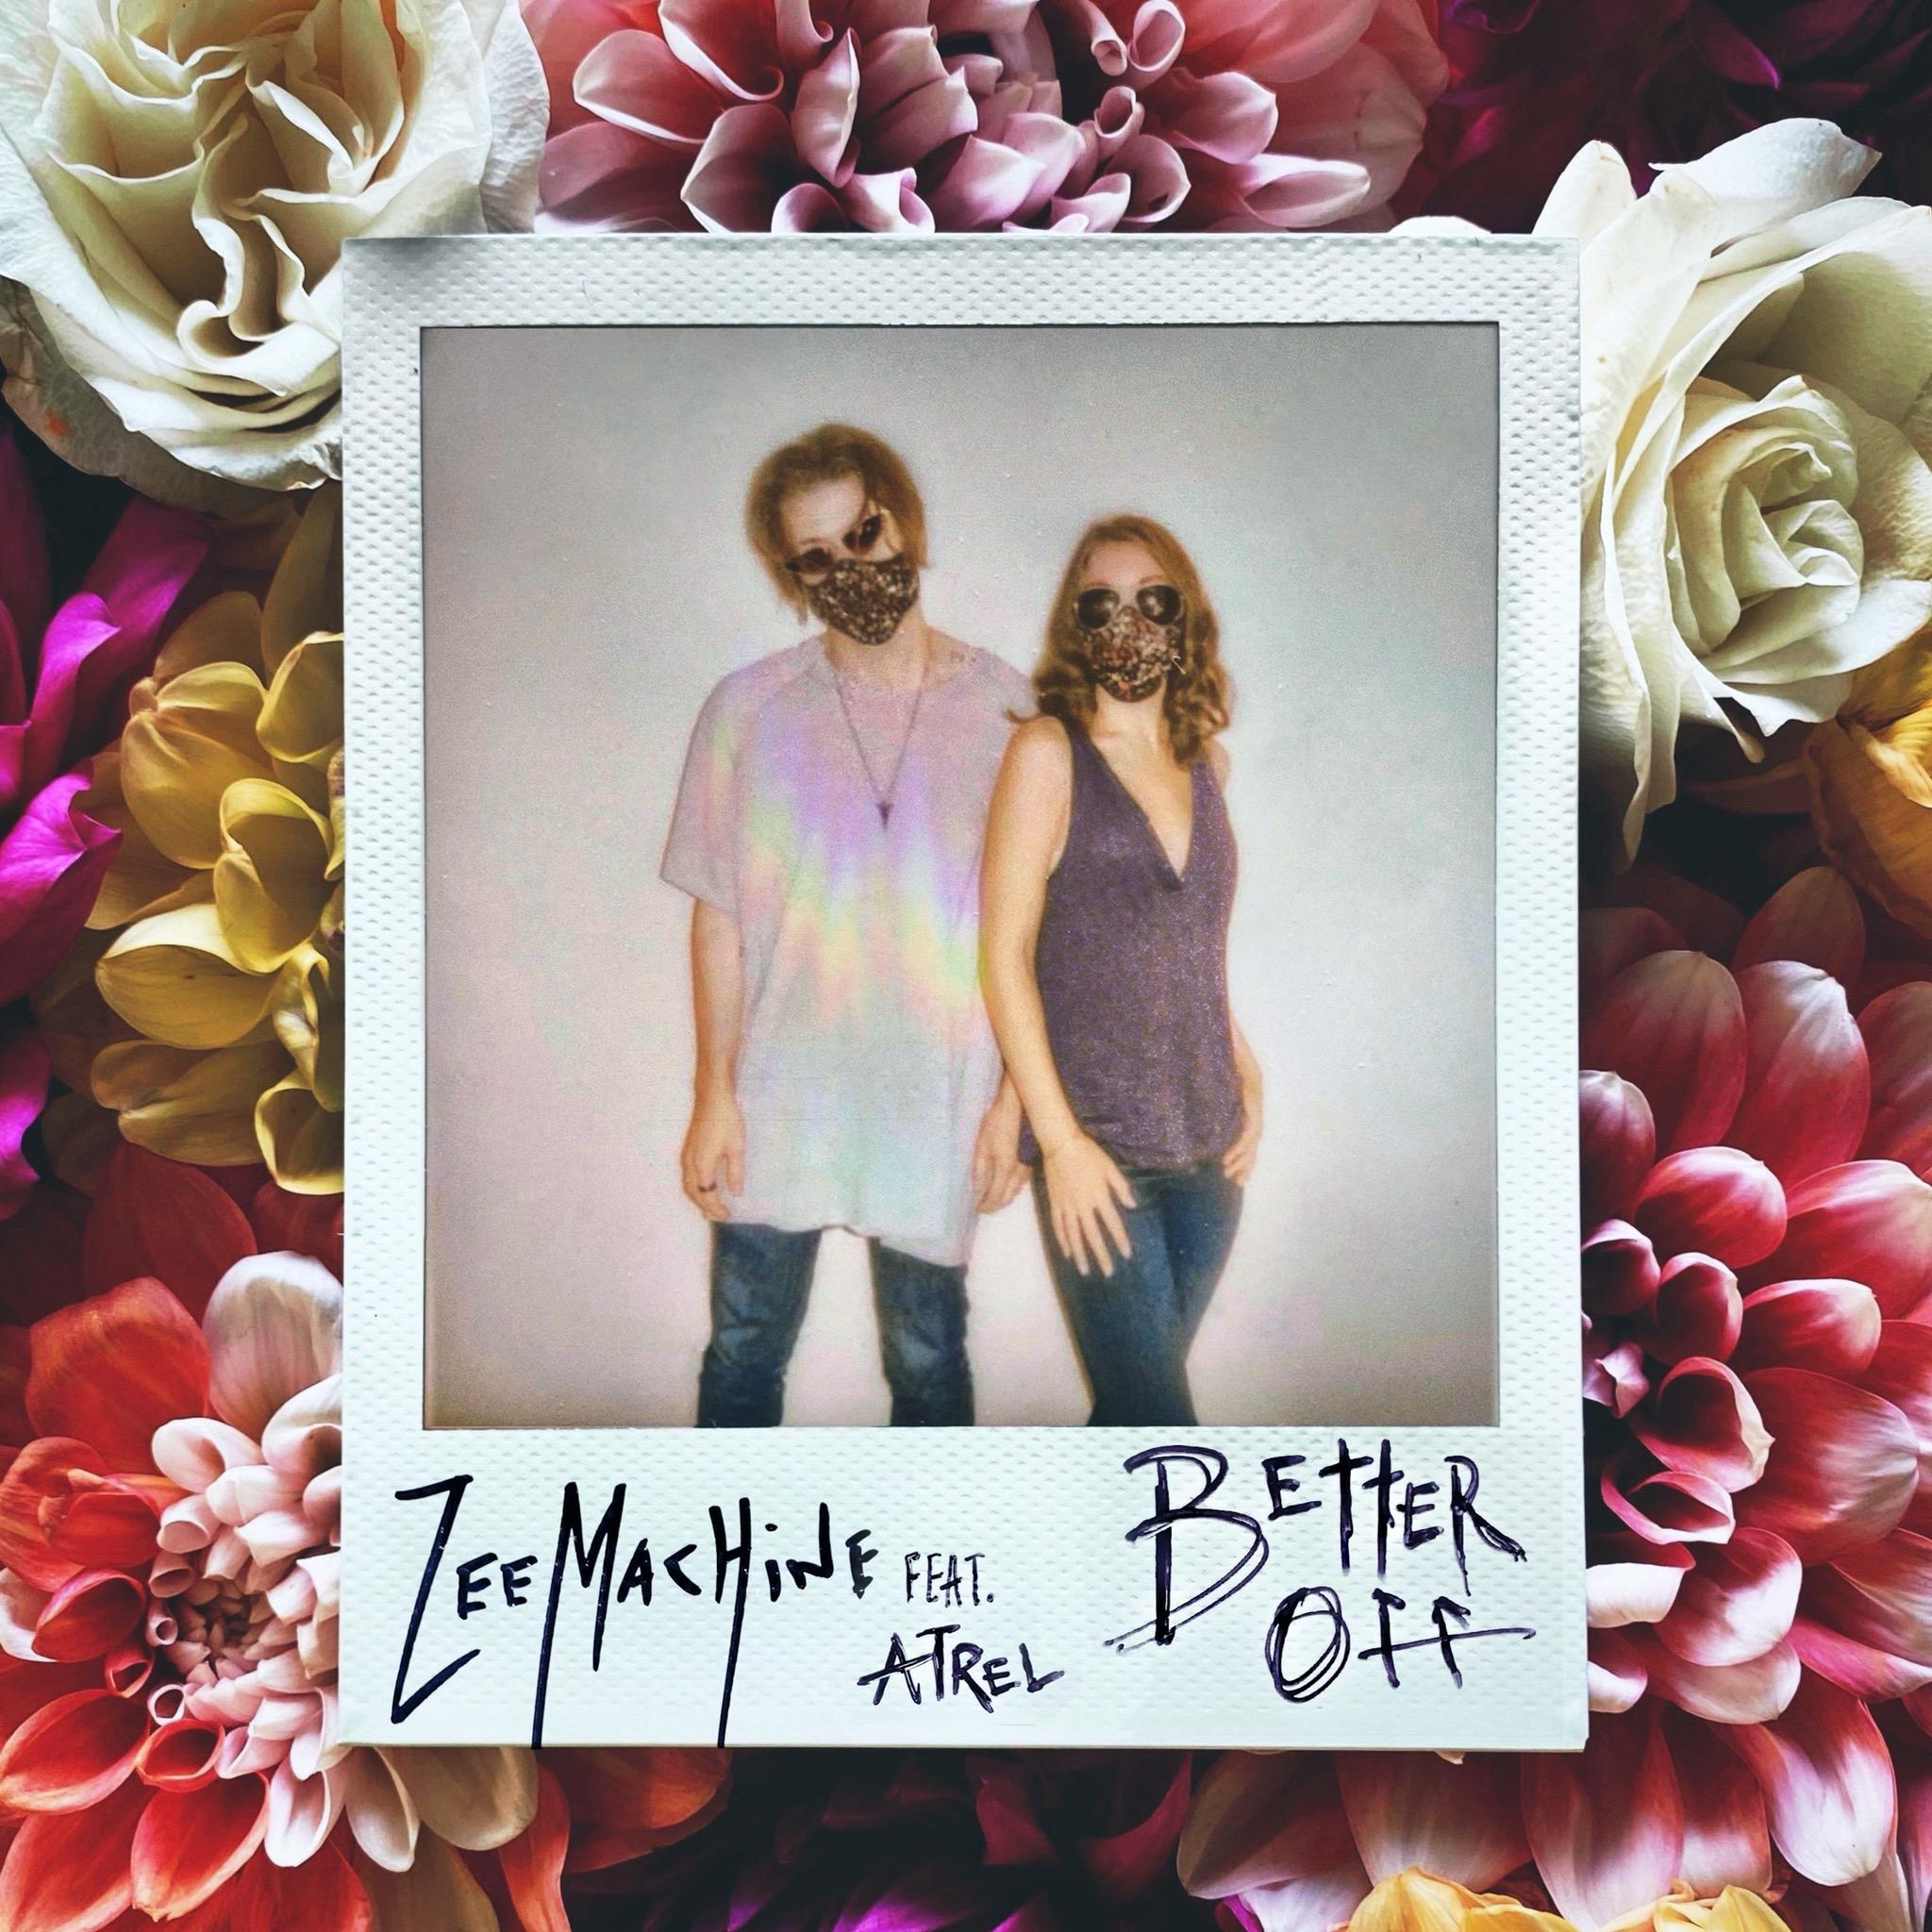 """Better Off"" - Zee Machine featuring Atrel"